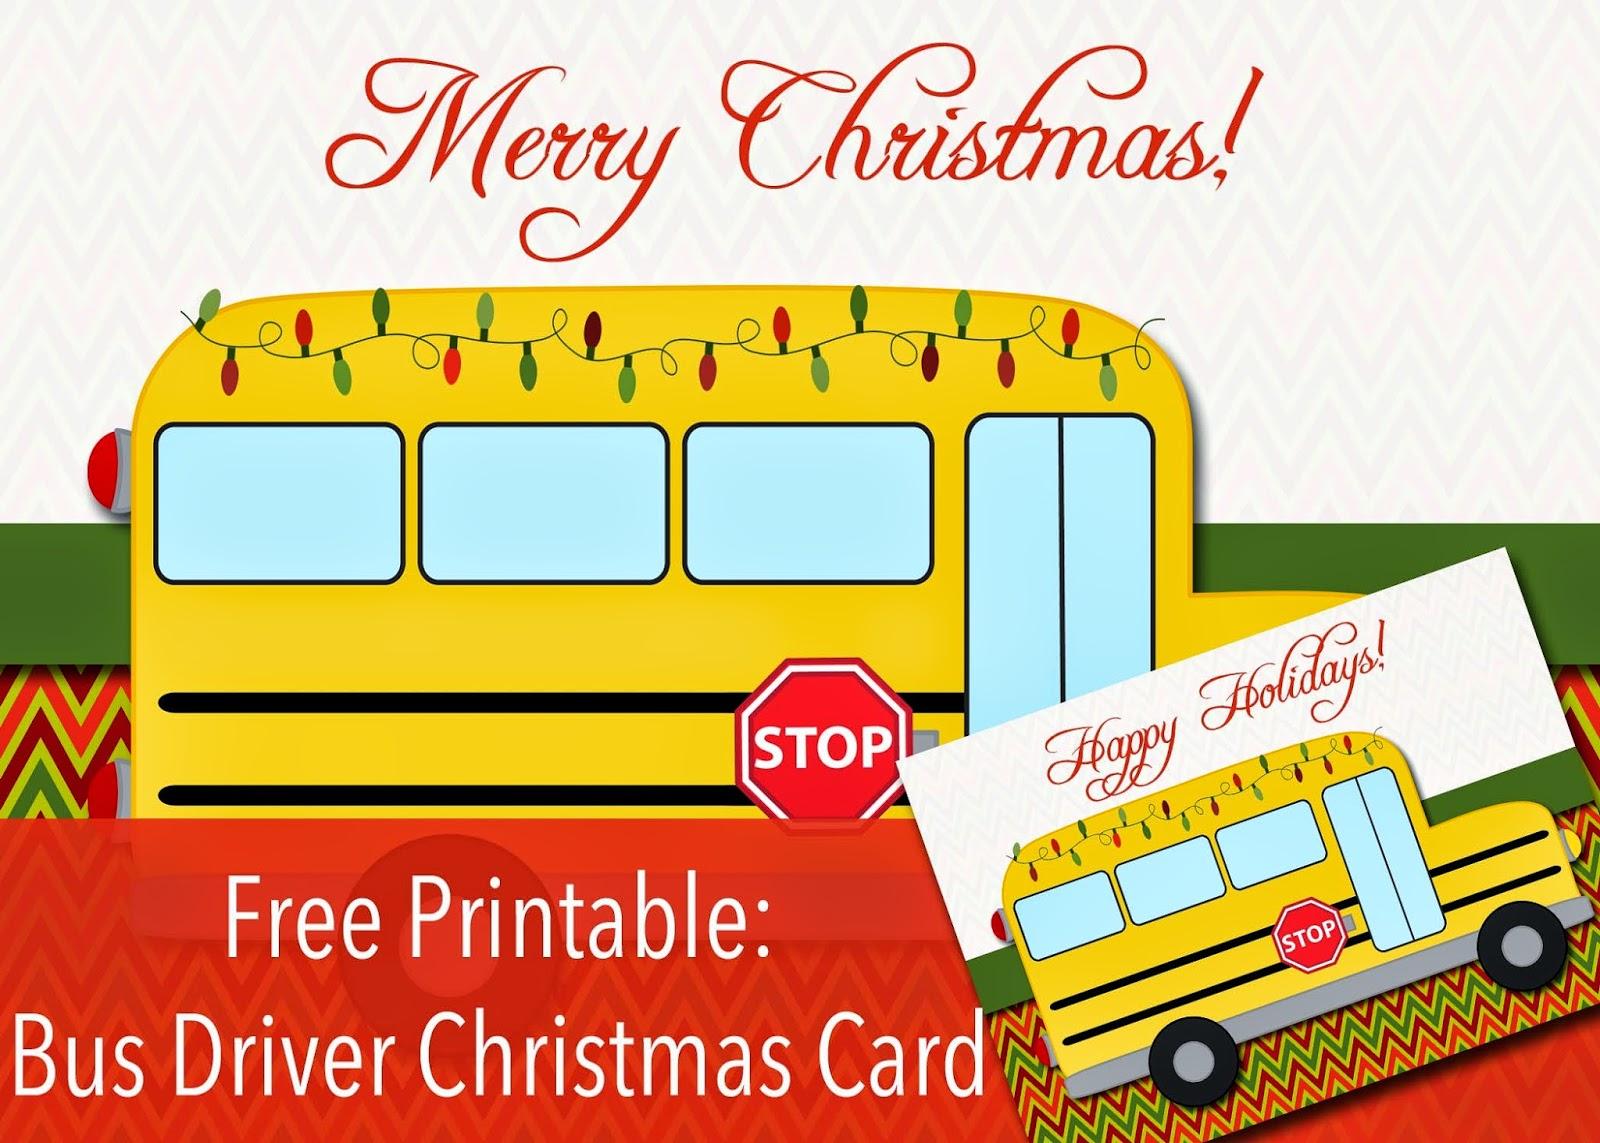 Bus driver gift for christmas